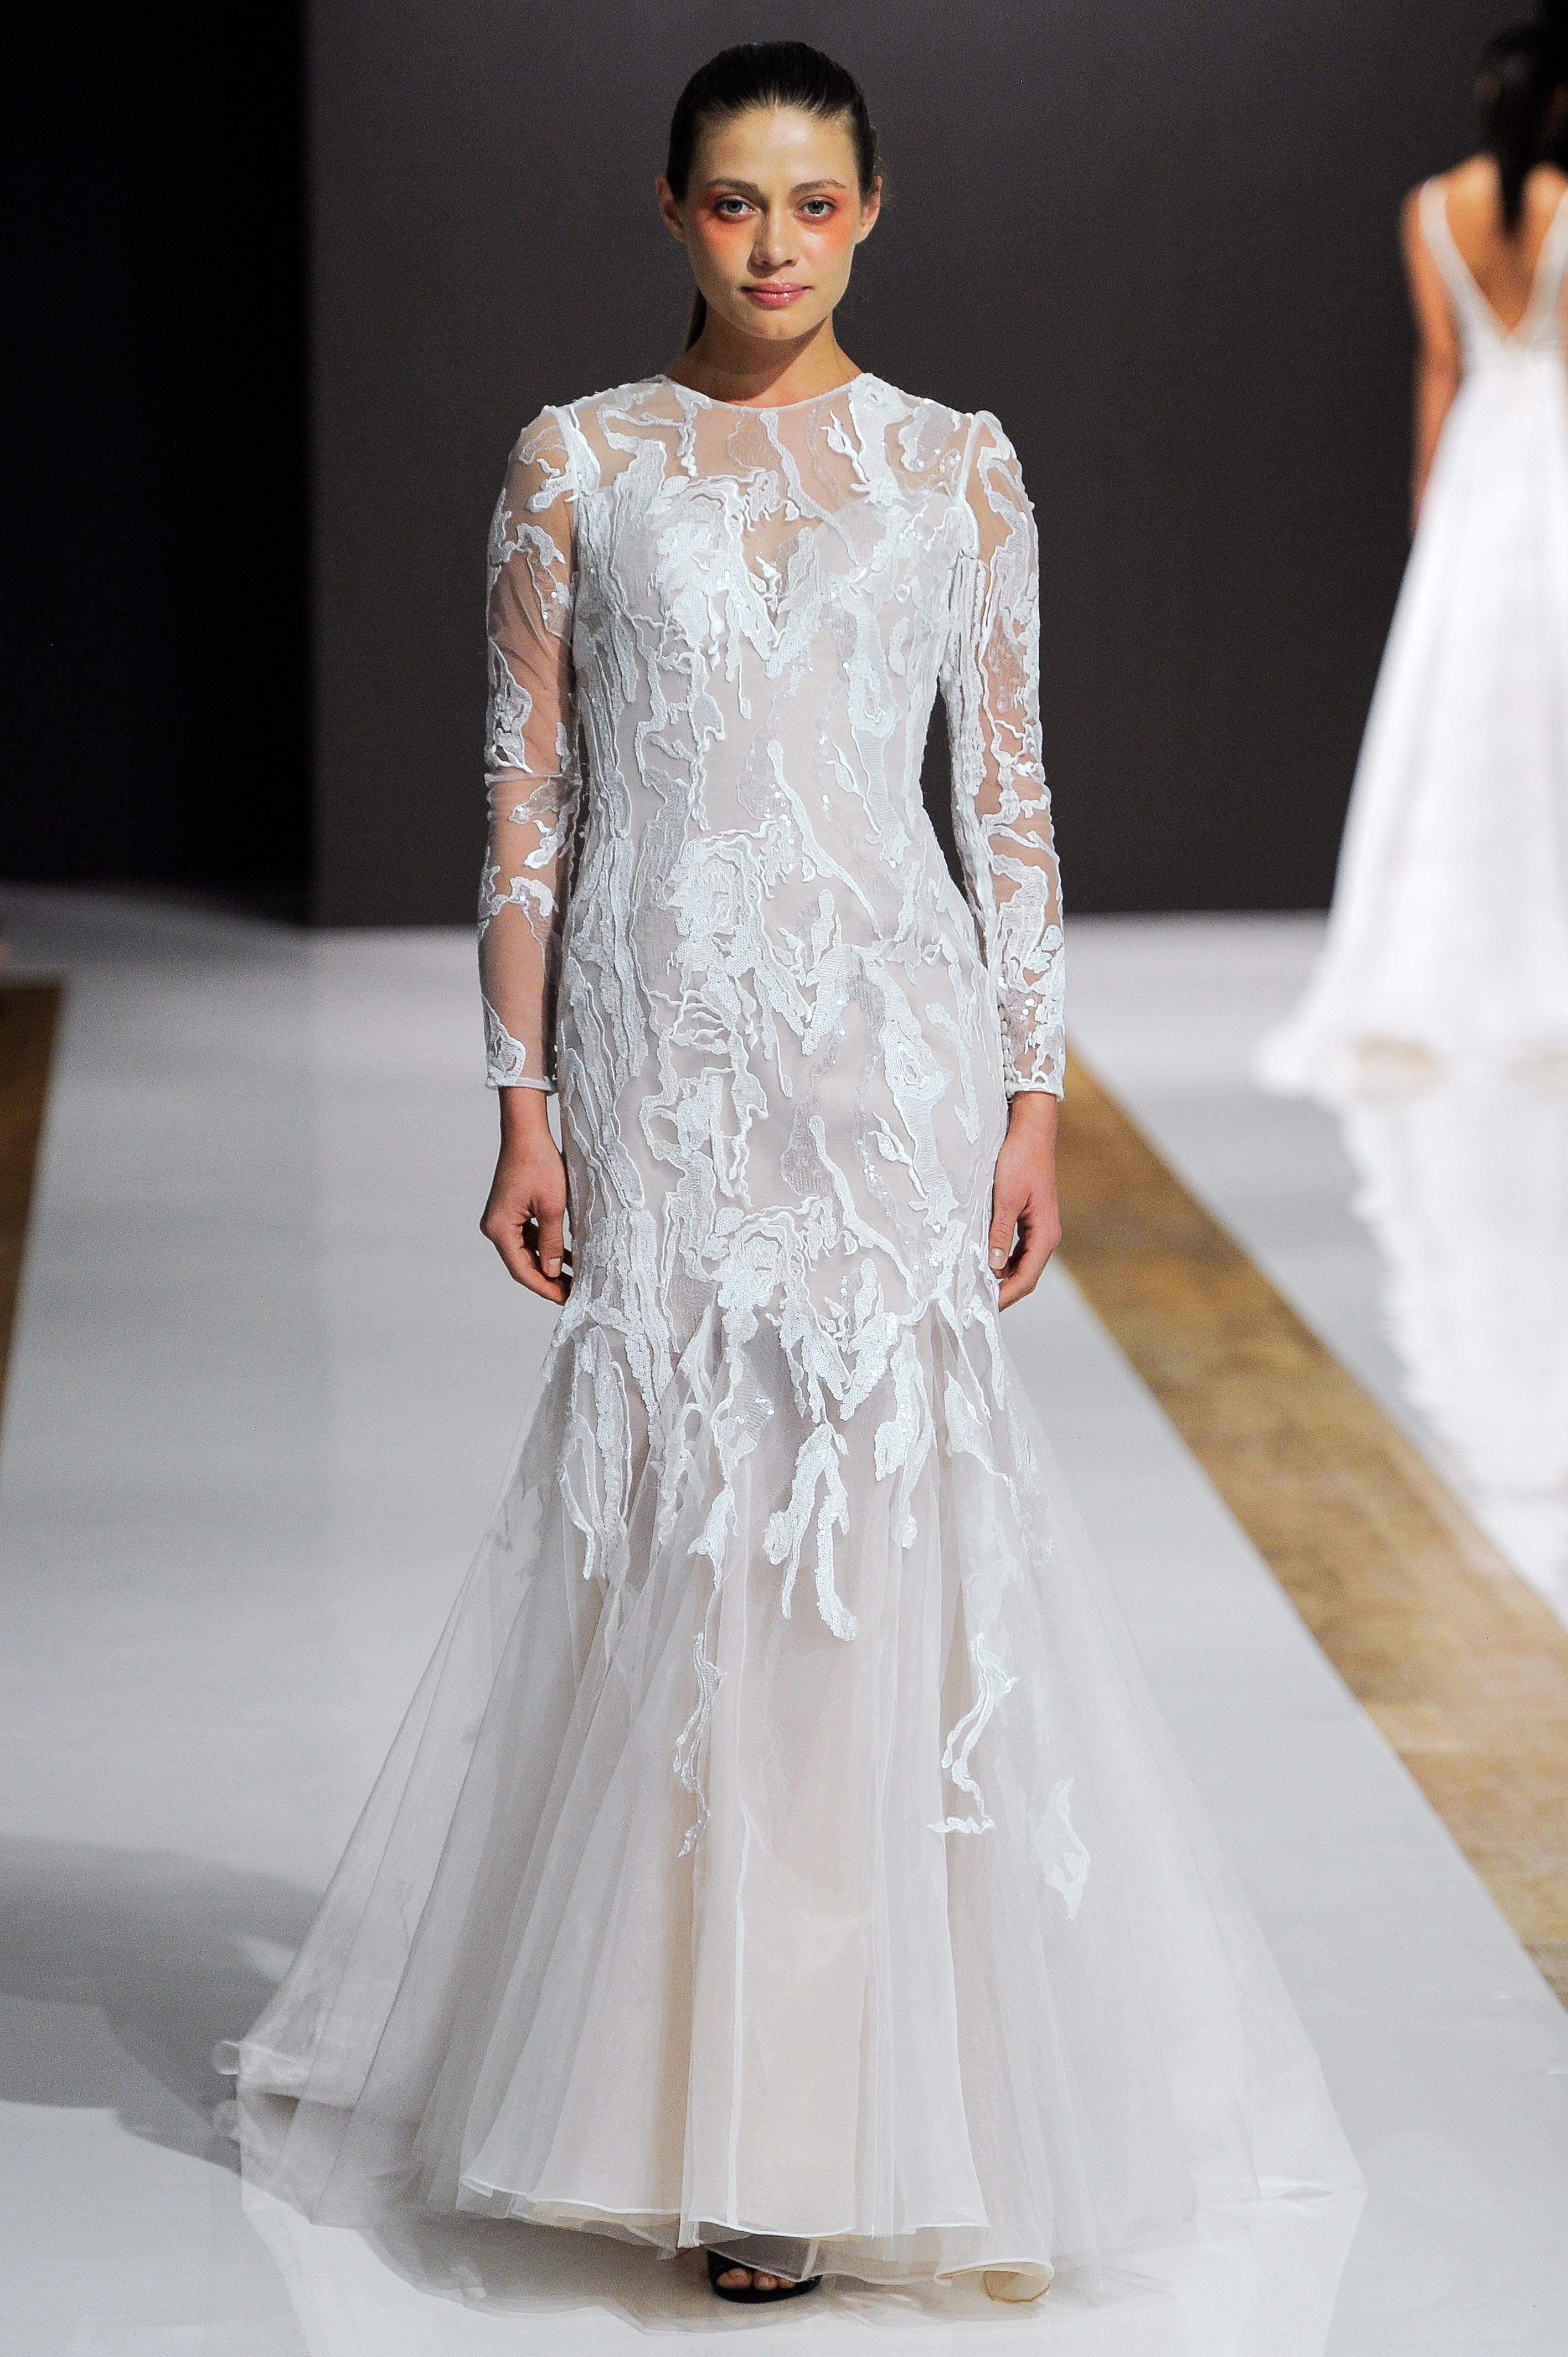 mark zunino wedding dress fall 2018 long sleeves sheer trumpet